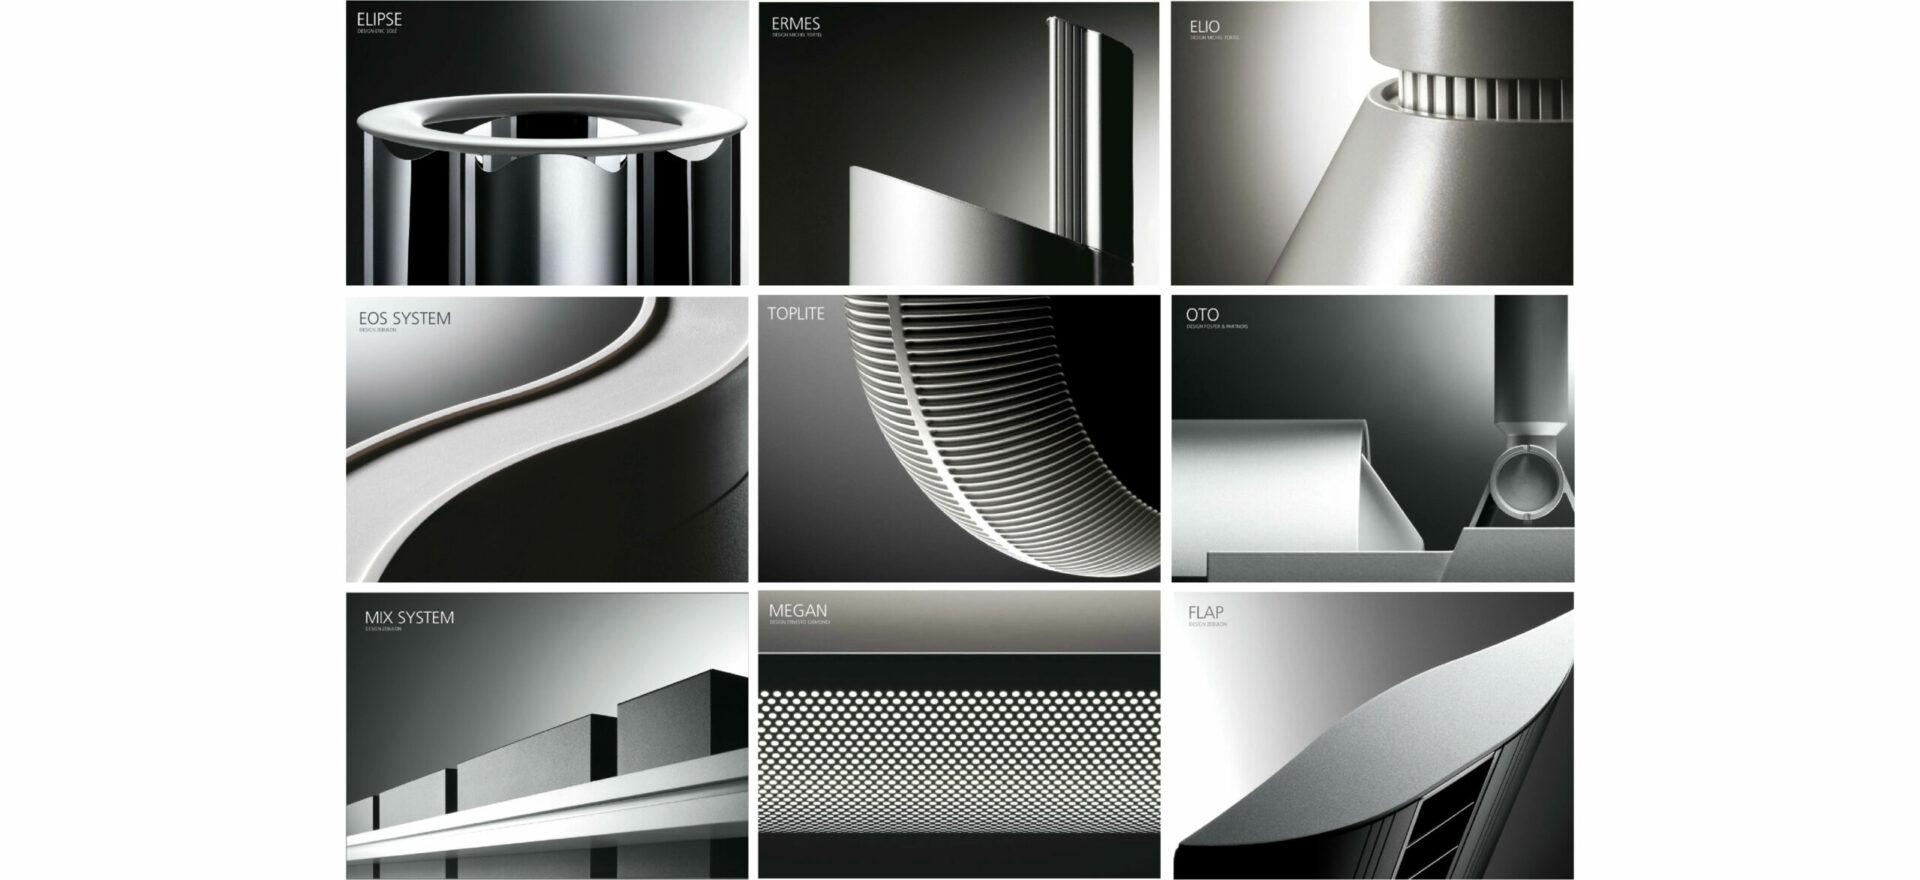 Nine light catalogues showing Elipse, Ermes, Elio, EOS System, Toplite, Oto, Mix System, Megan and Flap lights from Artemide Architectural.